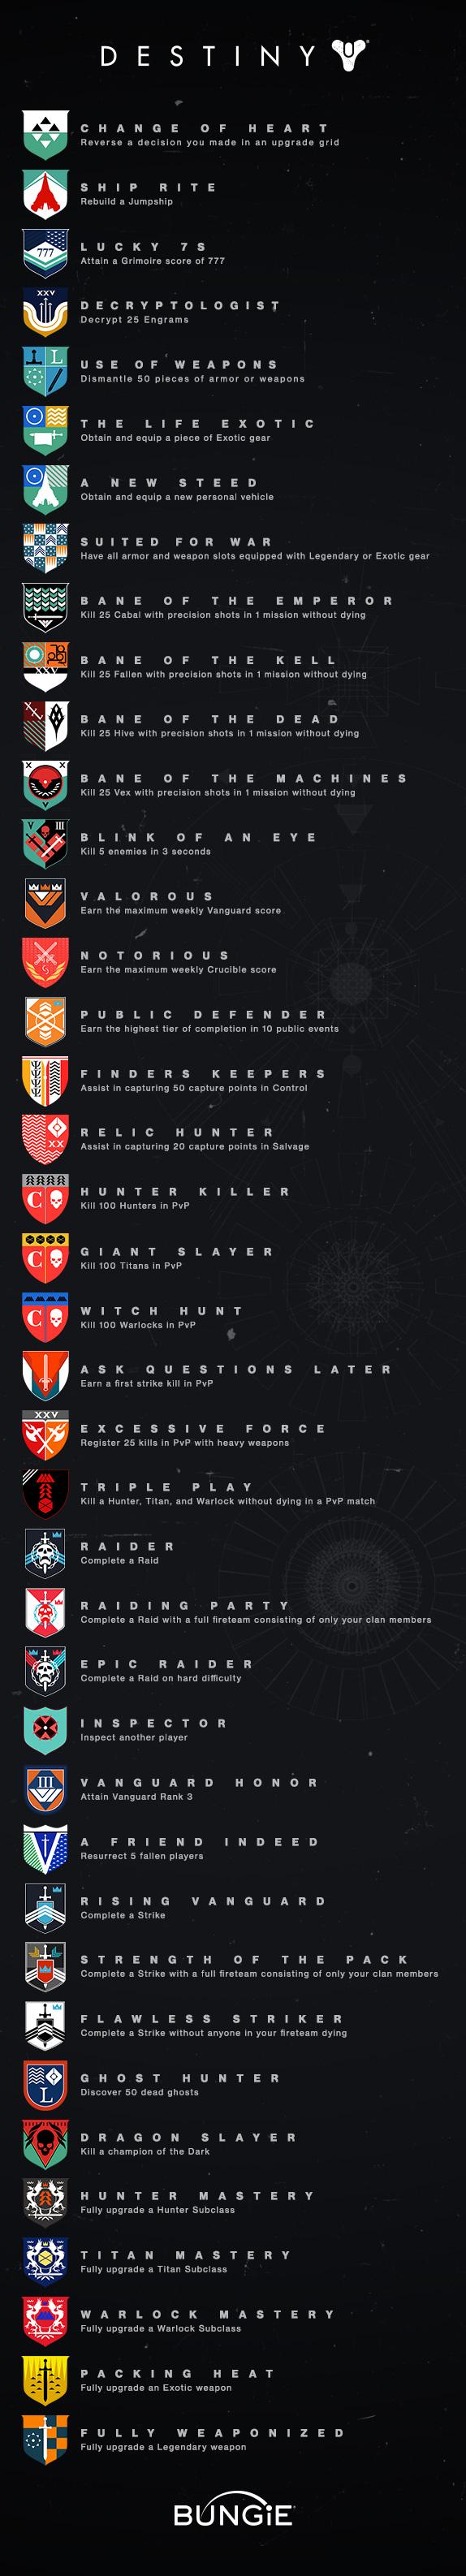 Destiny-Erfolge